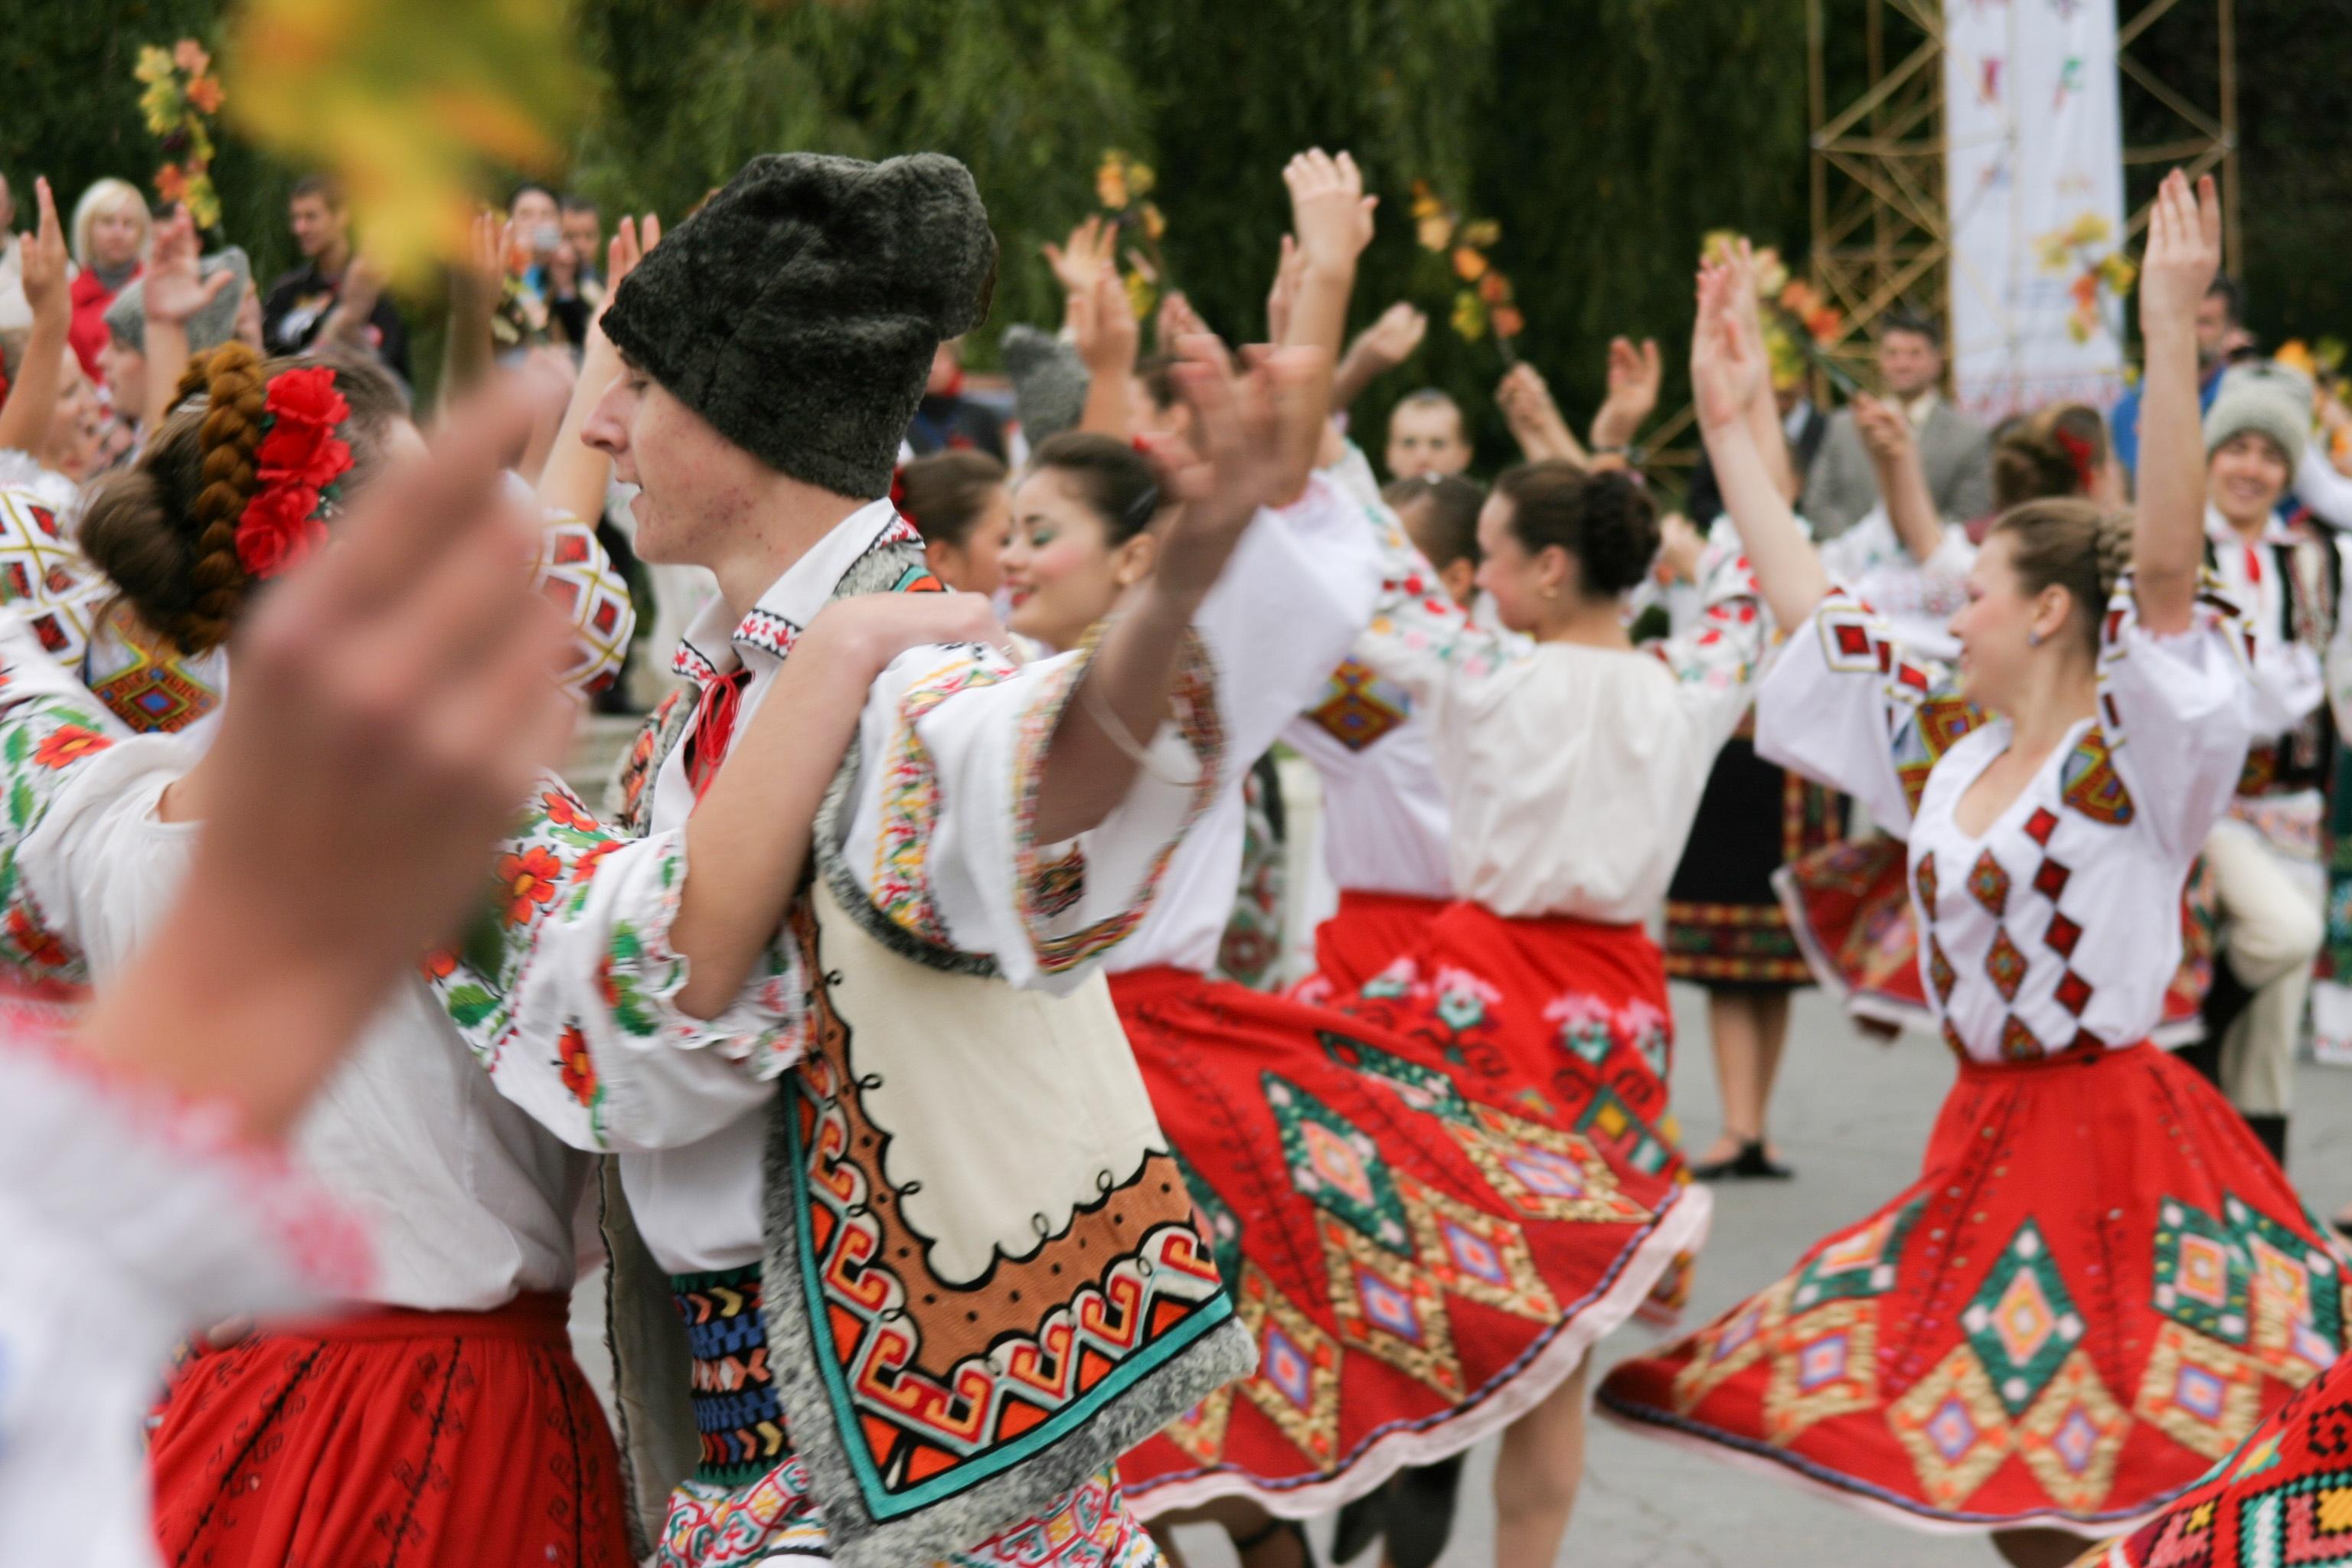 WINE Festival Tour in Moldova          02-08 October 2020